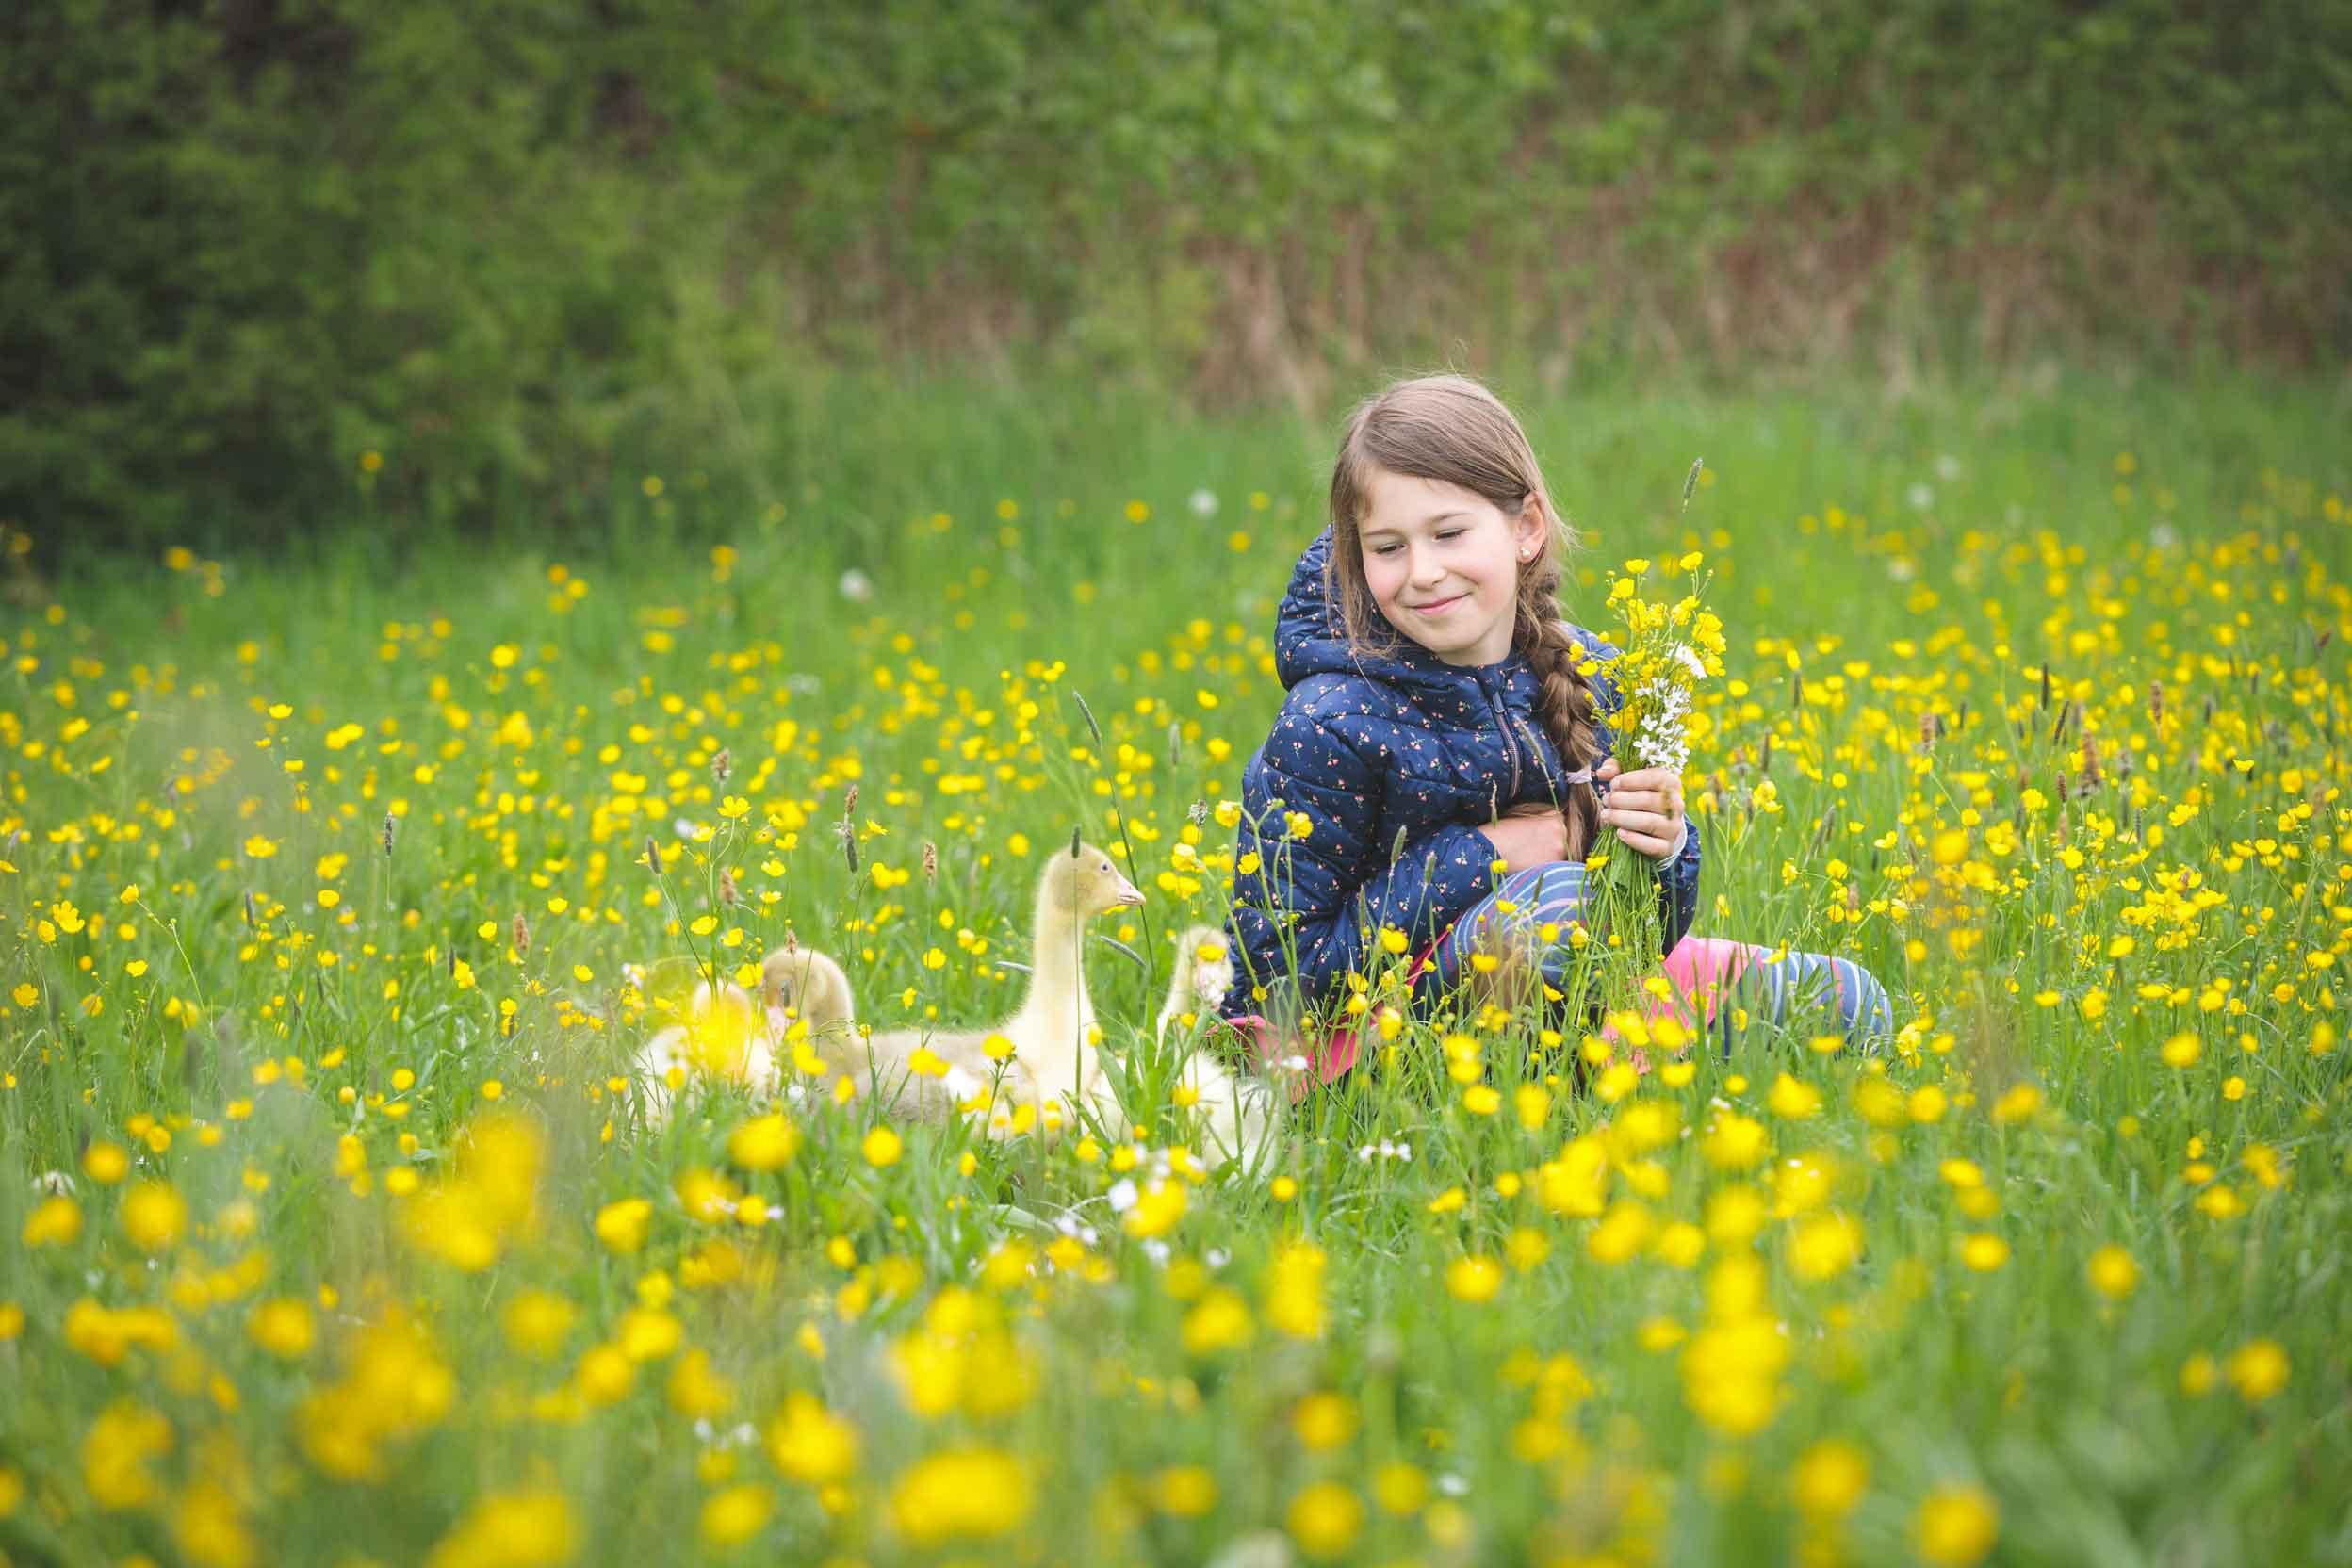 Kinderportraits mit Gänseküken IMG 0640w